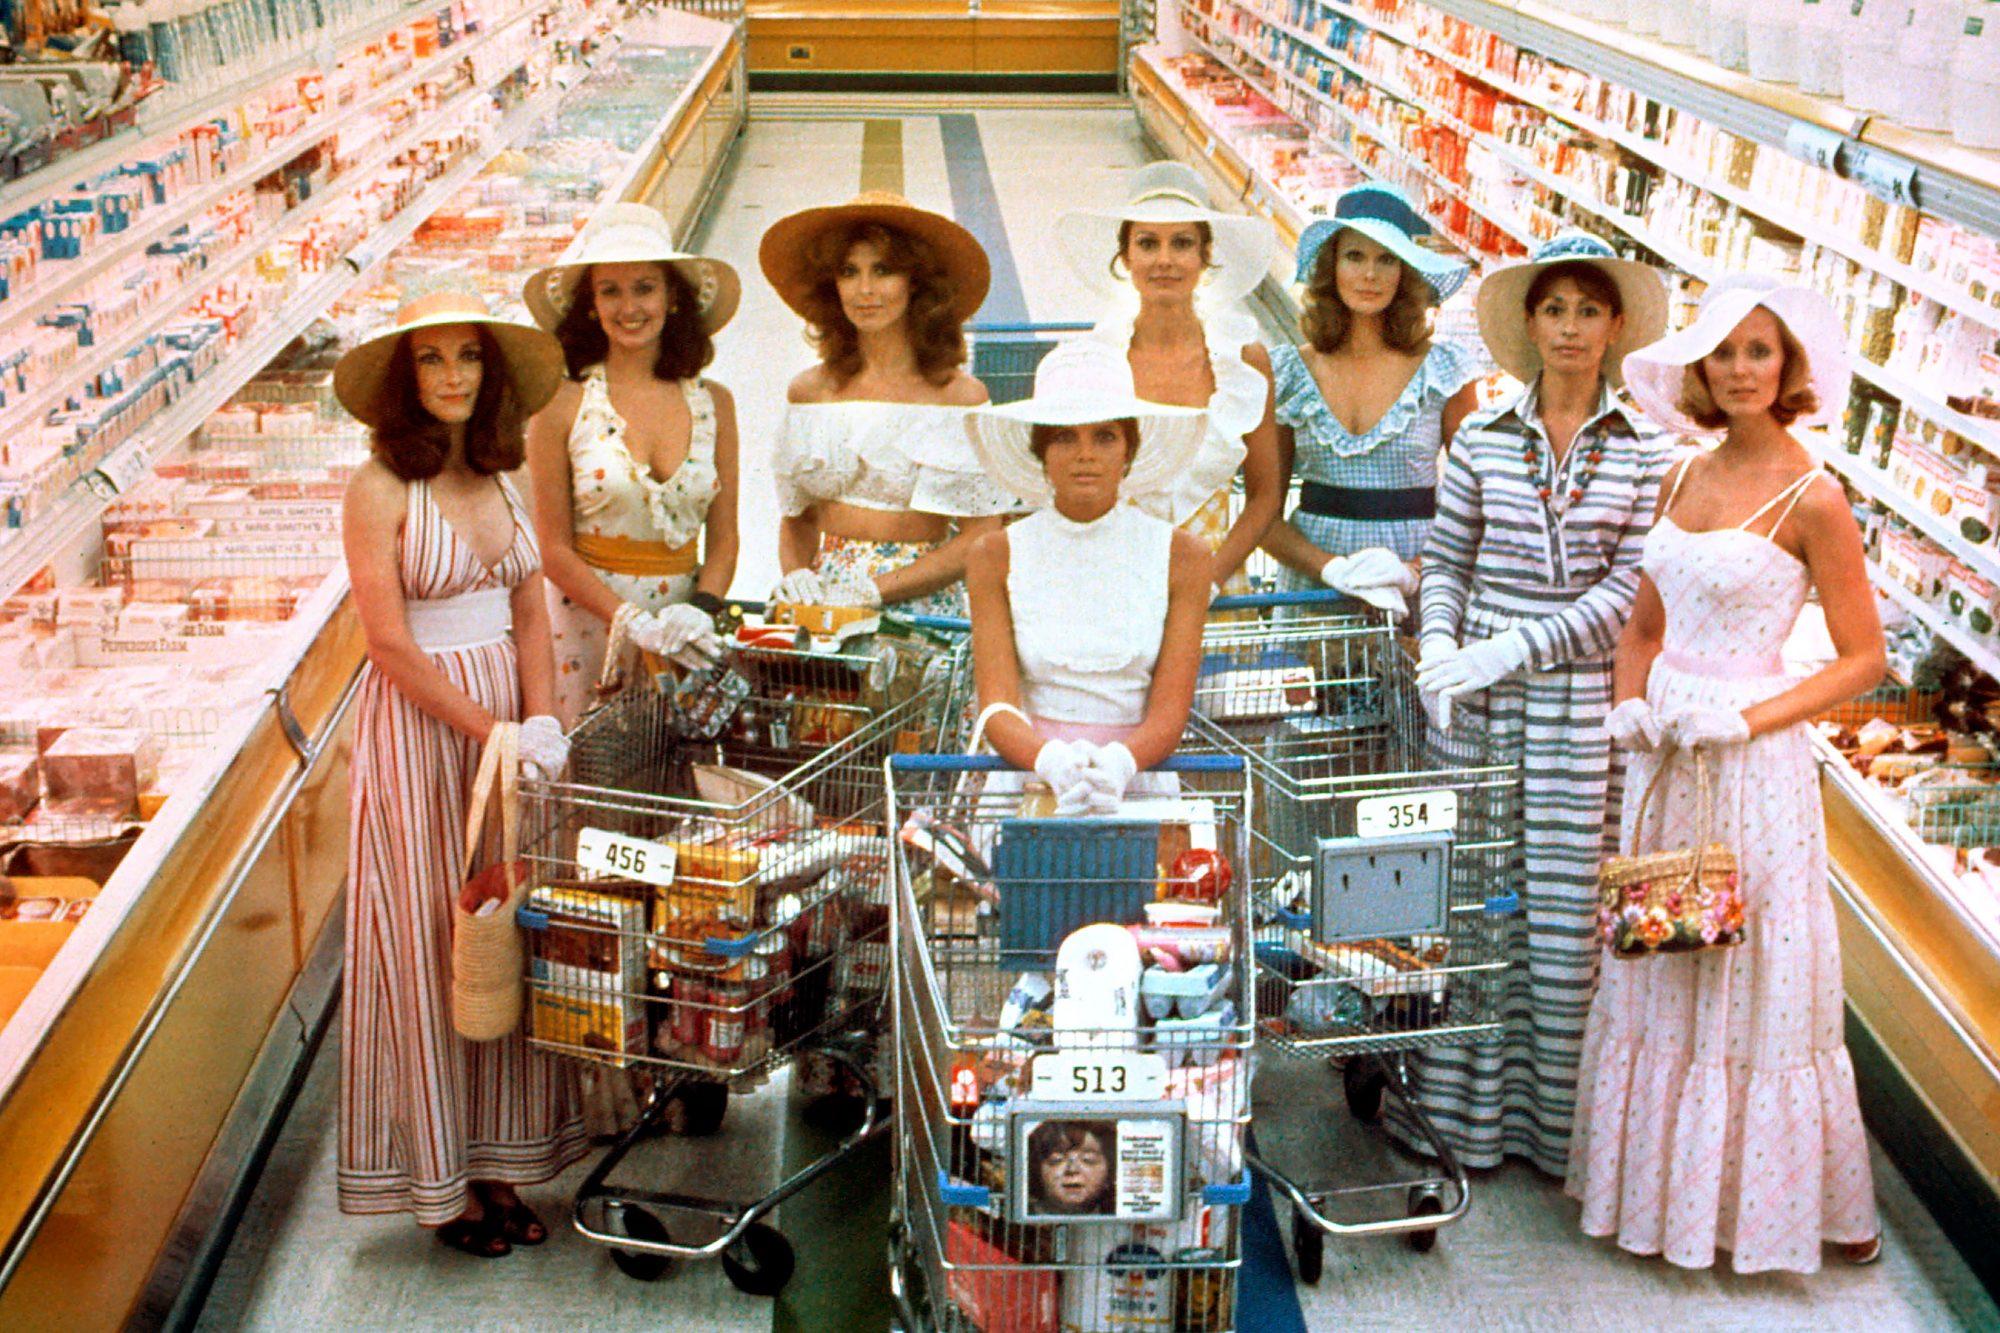 THE STEPFORD WIVES, Toni Reid, Carole Mallory, Tina Louise, Katherine Ross, Paula Prentiss, Barbara